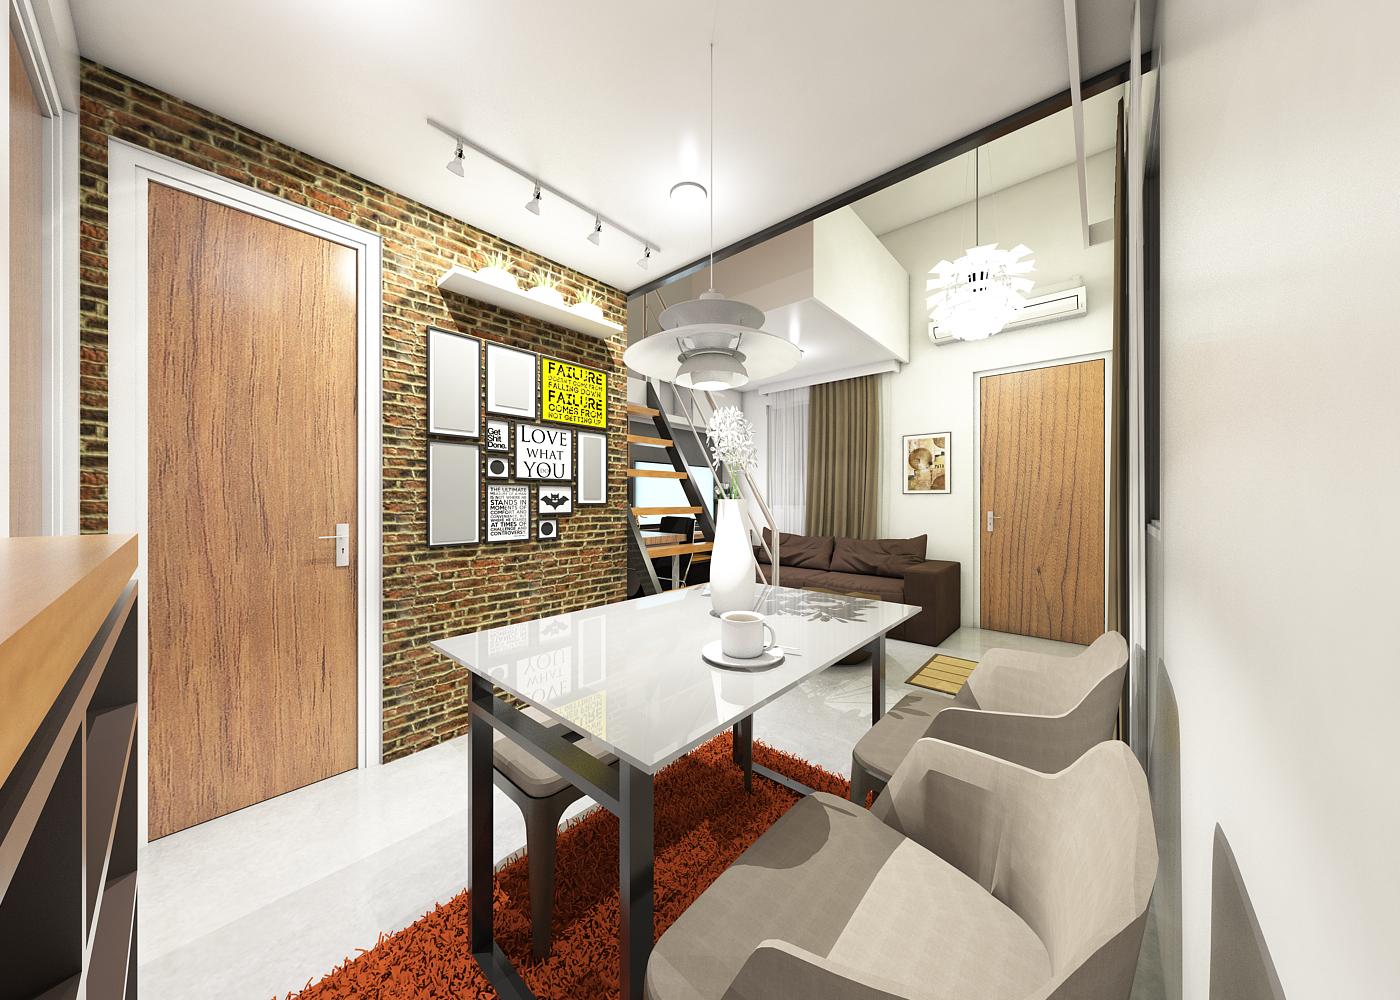 Proposed Loft Type Row House Interior Design By Darwinmerispe On Deviantart